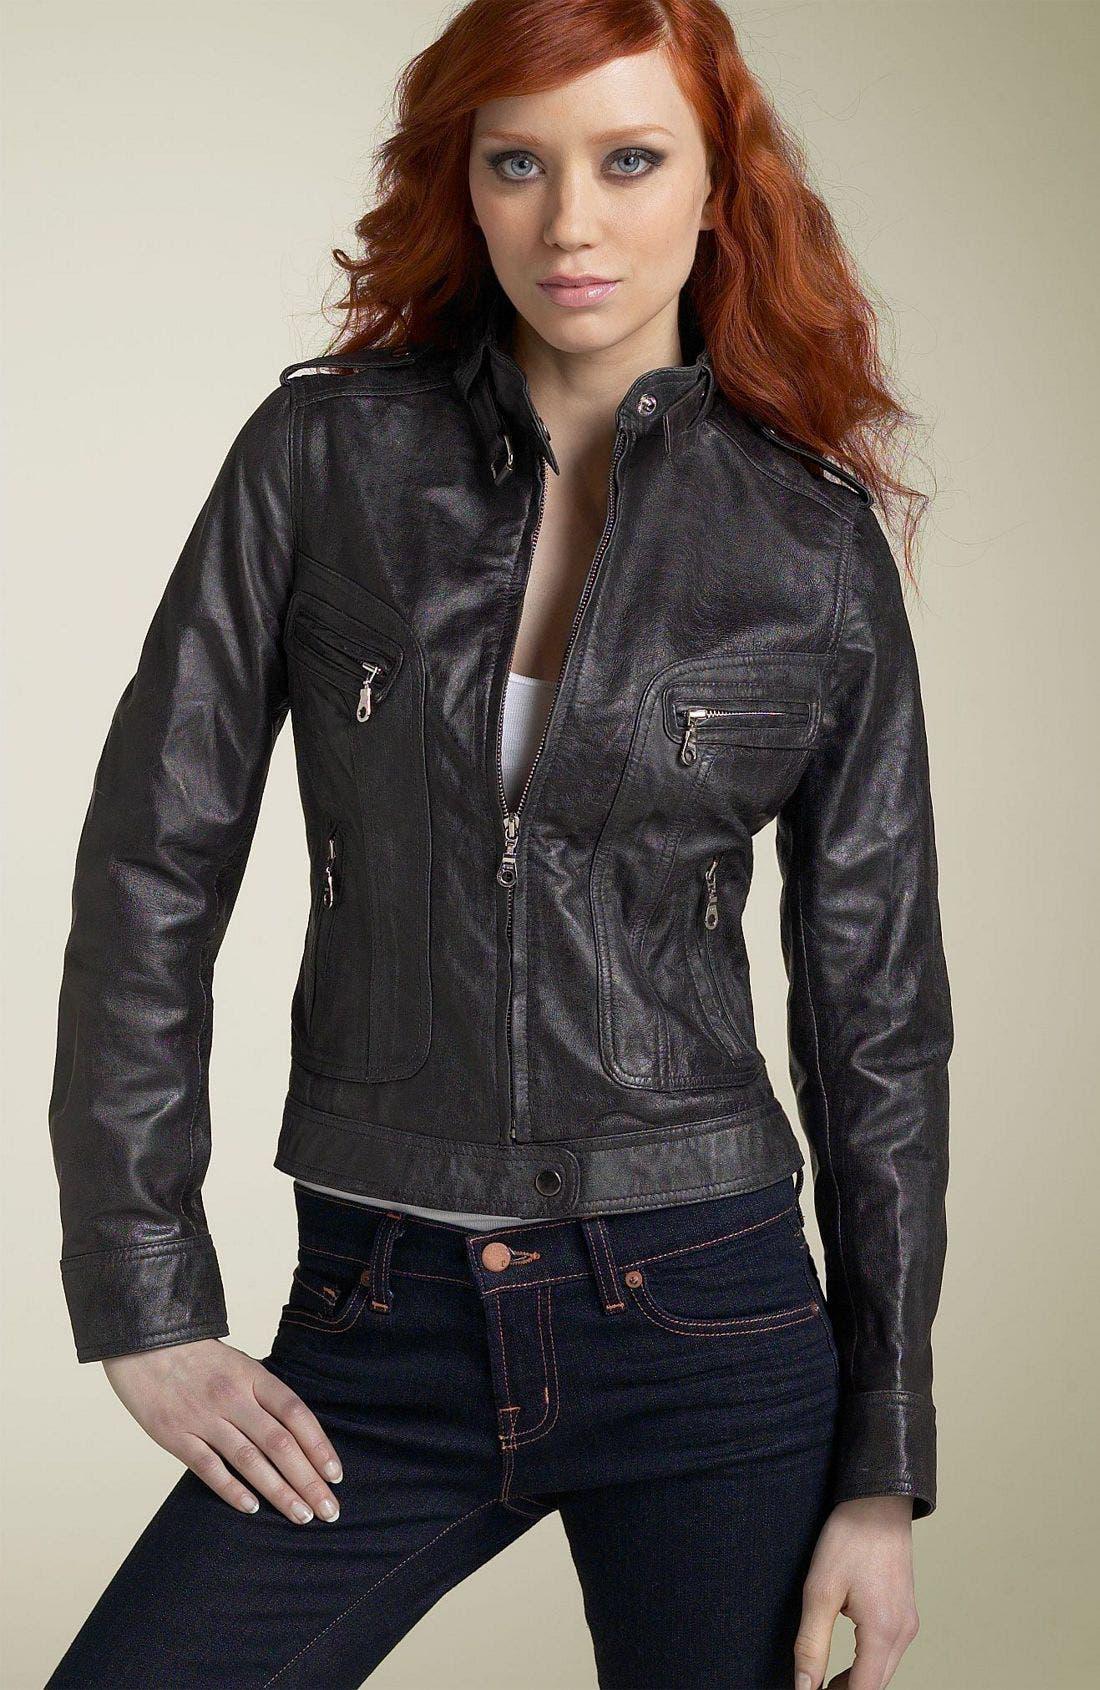 Kenna-T Motorcycle Jacket,                             Main thumbnail 1, color,                             Distressed Black